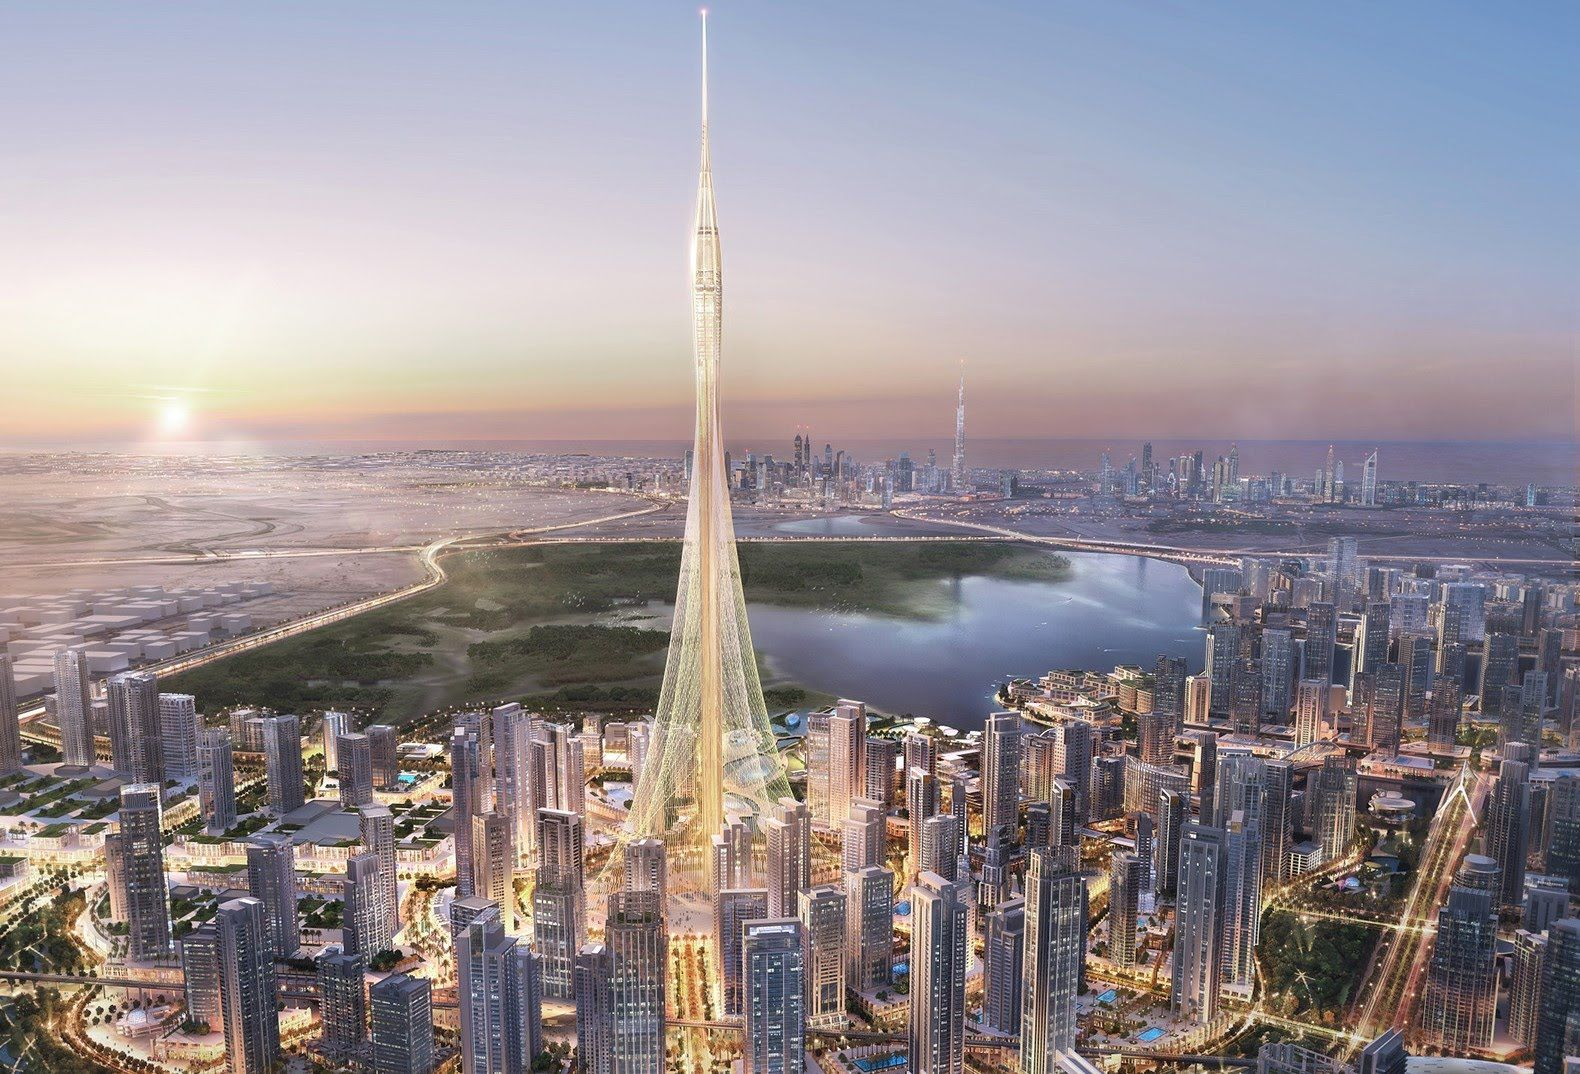 Dubais Next Tallest Building Dubai UAE [1580x1074]   See Http://www